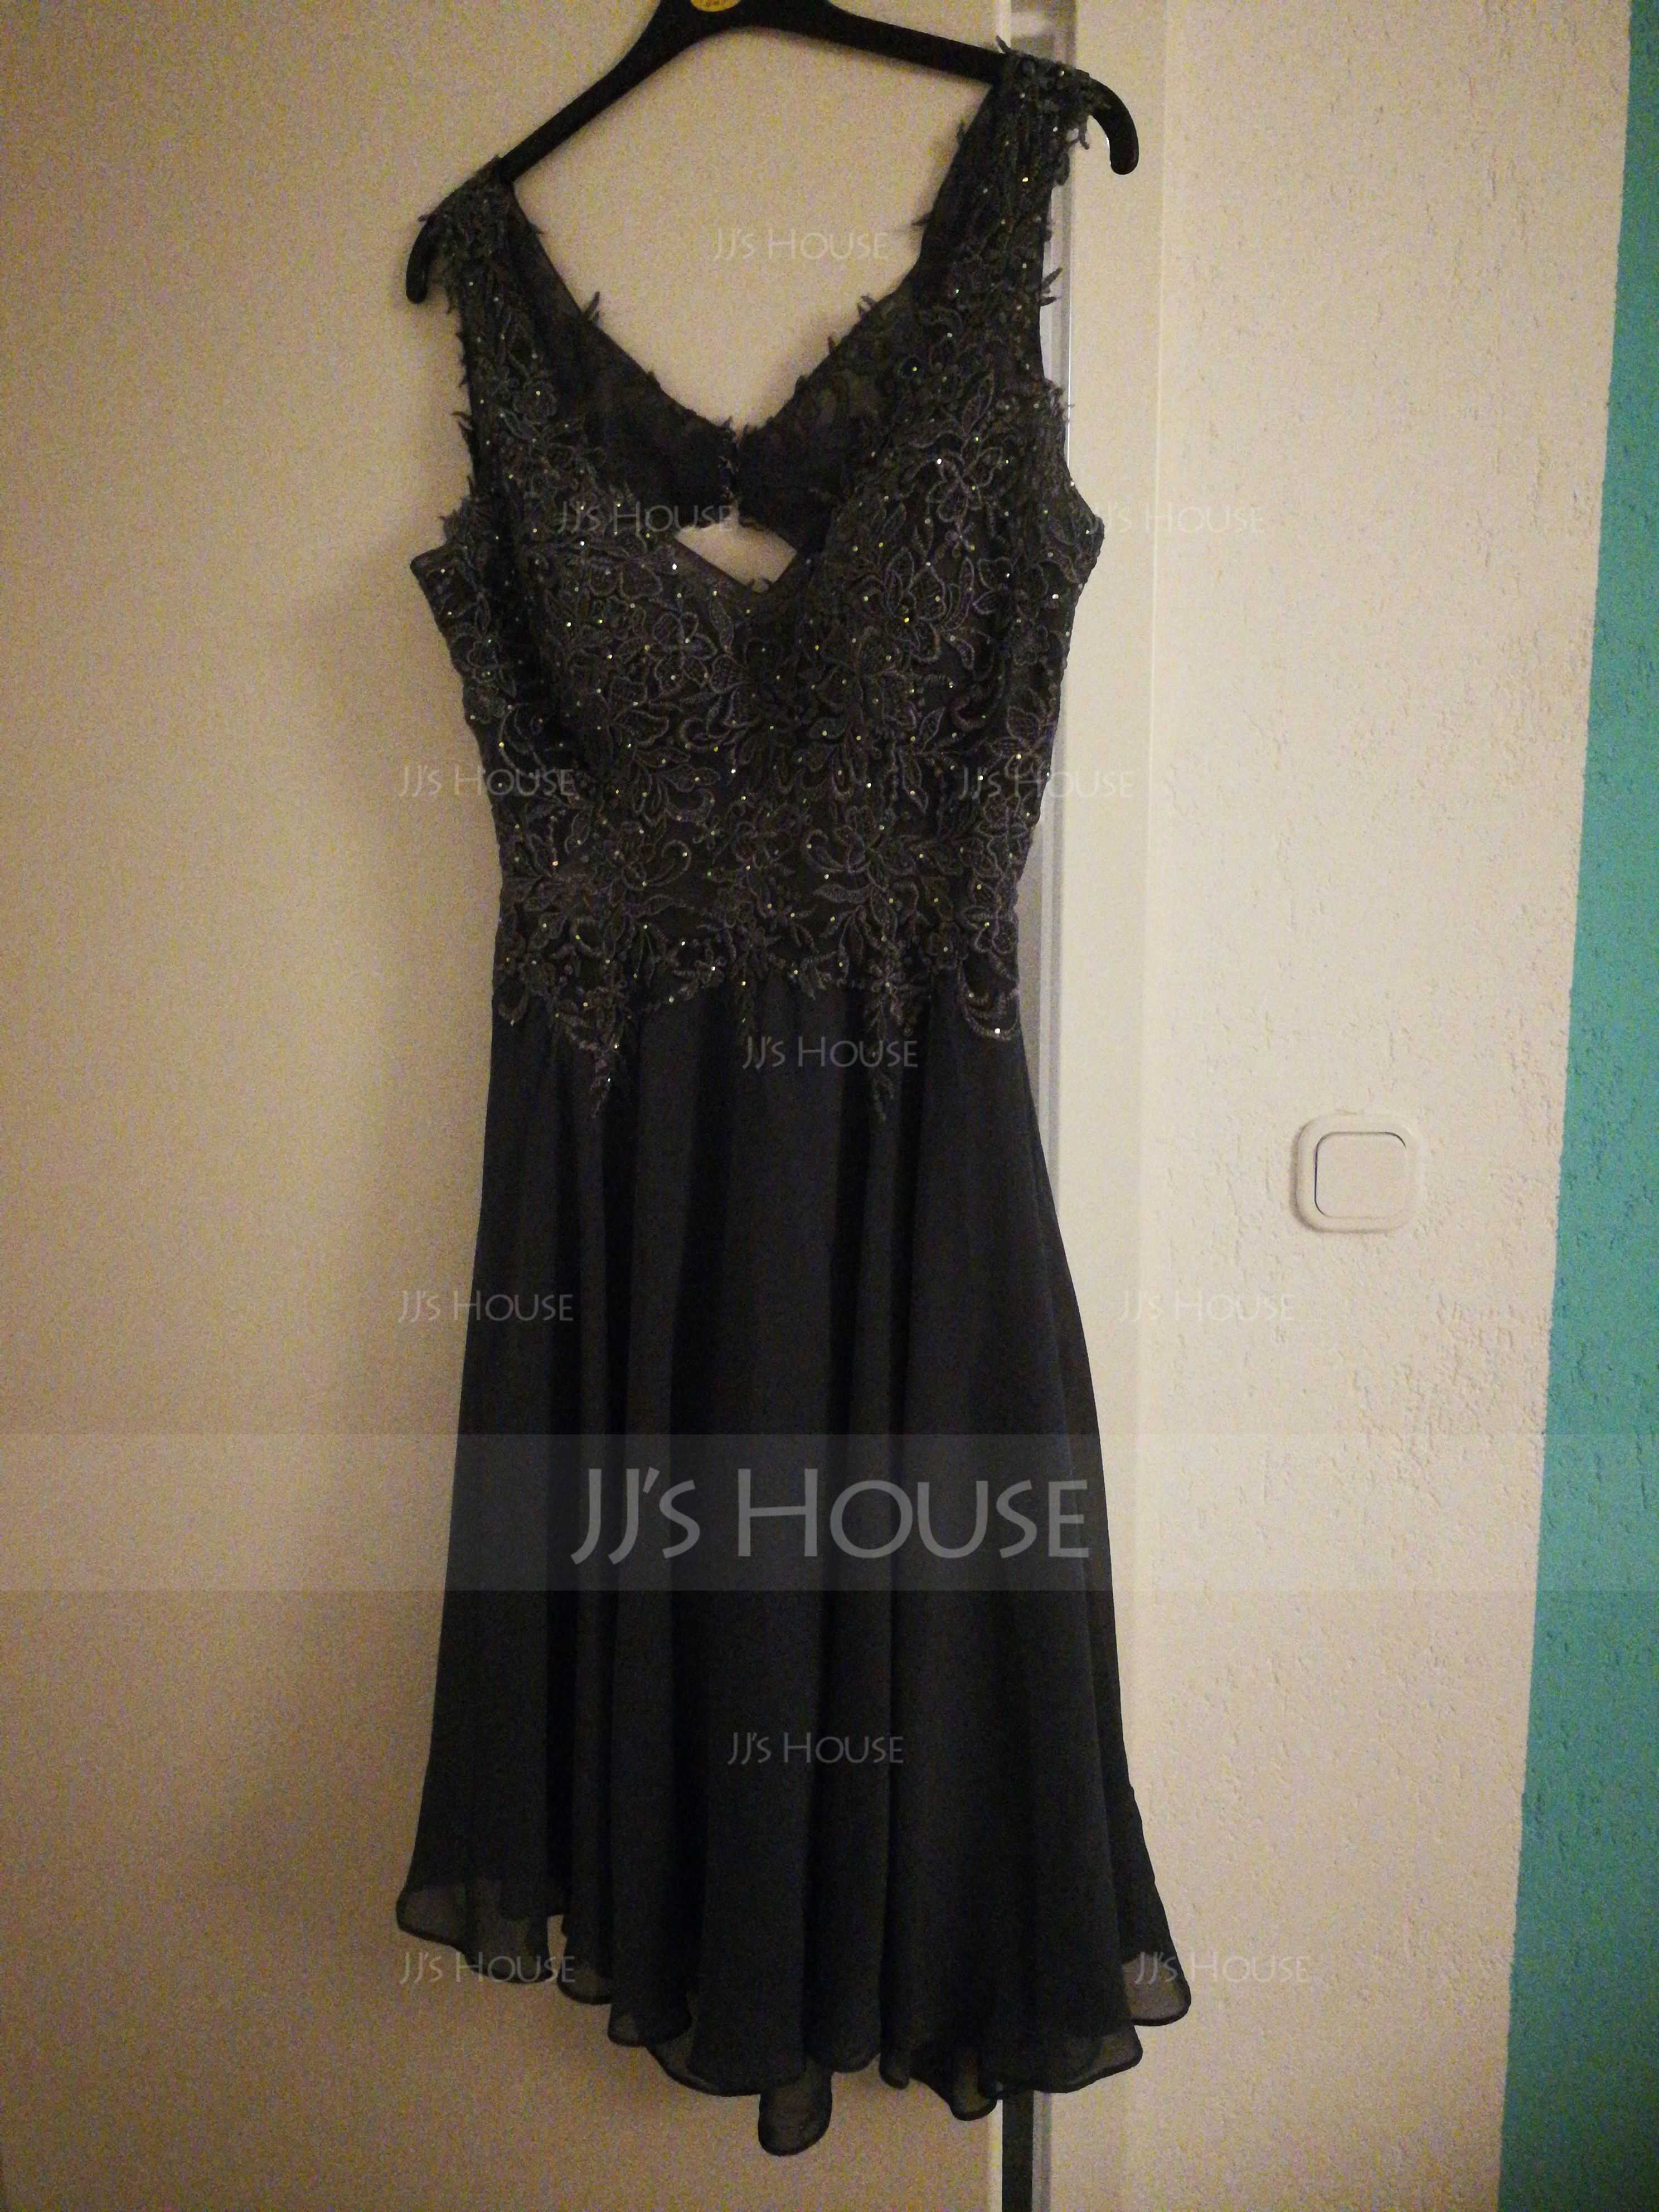 A-Line V-neck Knee-Length Chiffon Homecoming Dress With Beading (022203156)